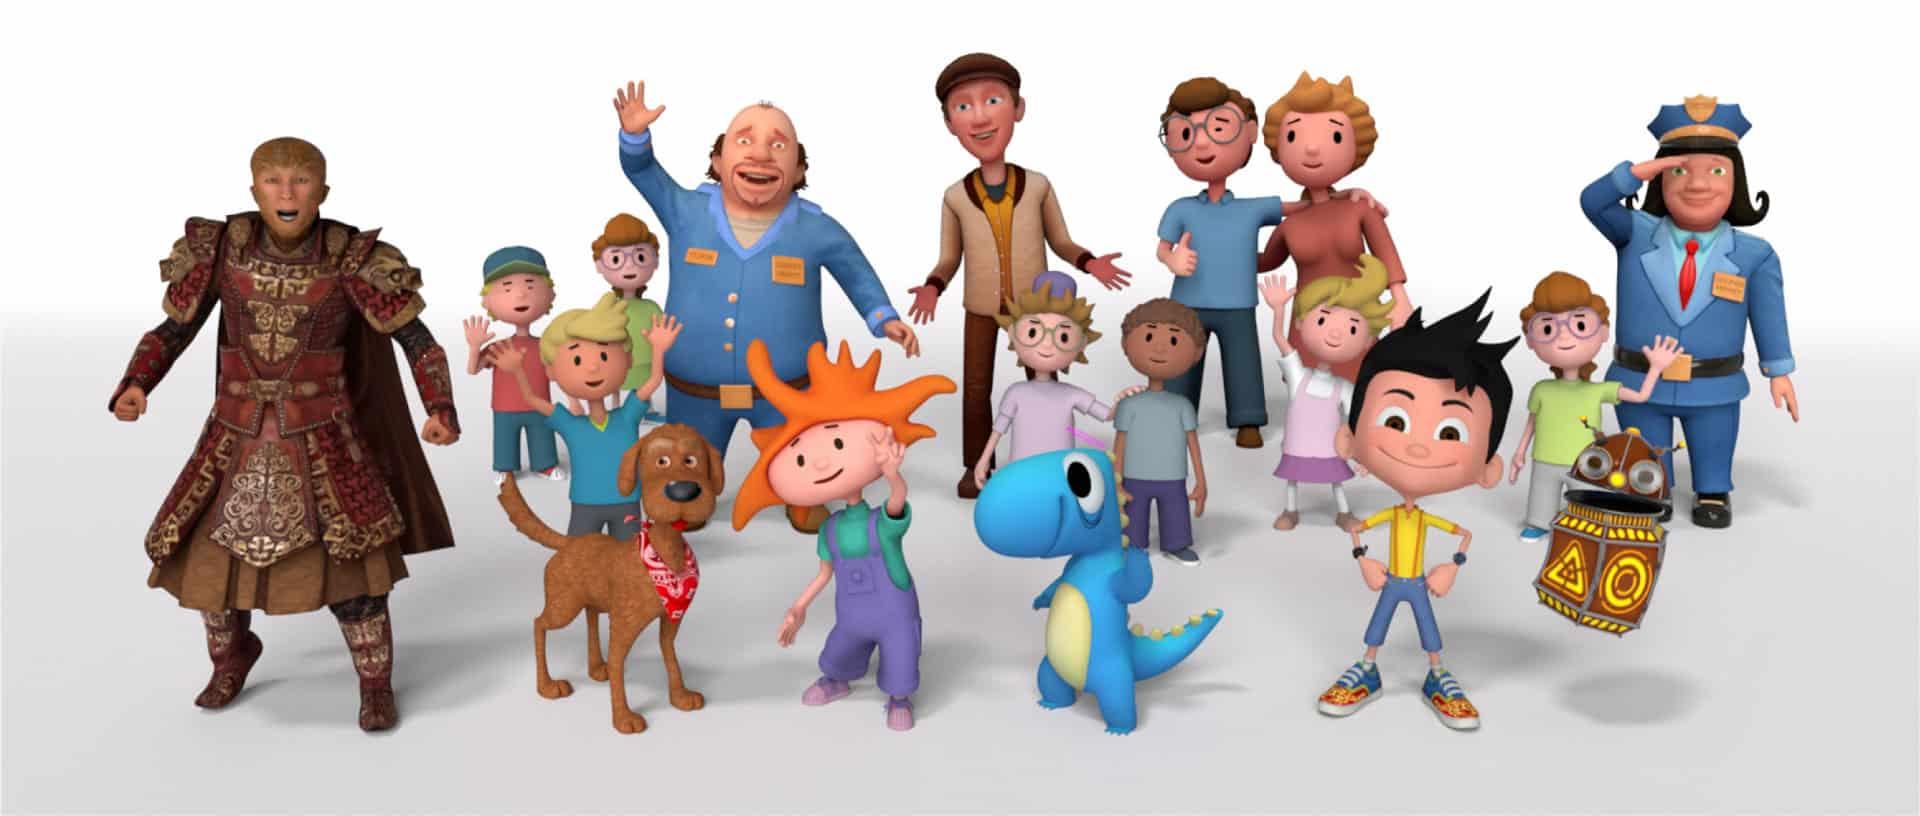 Stan Lee's Kids Universe characters